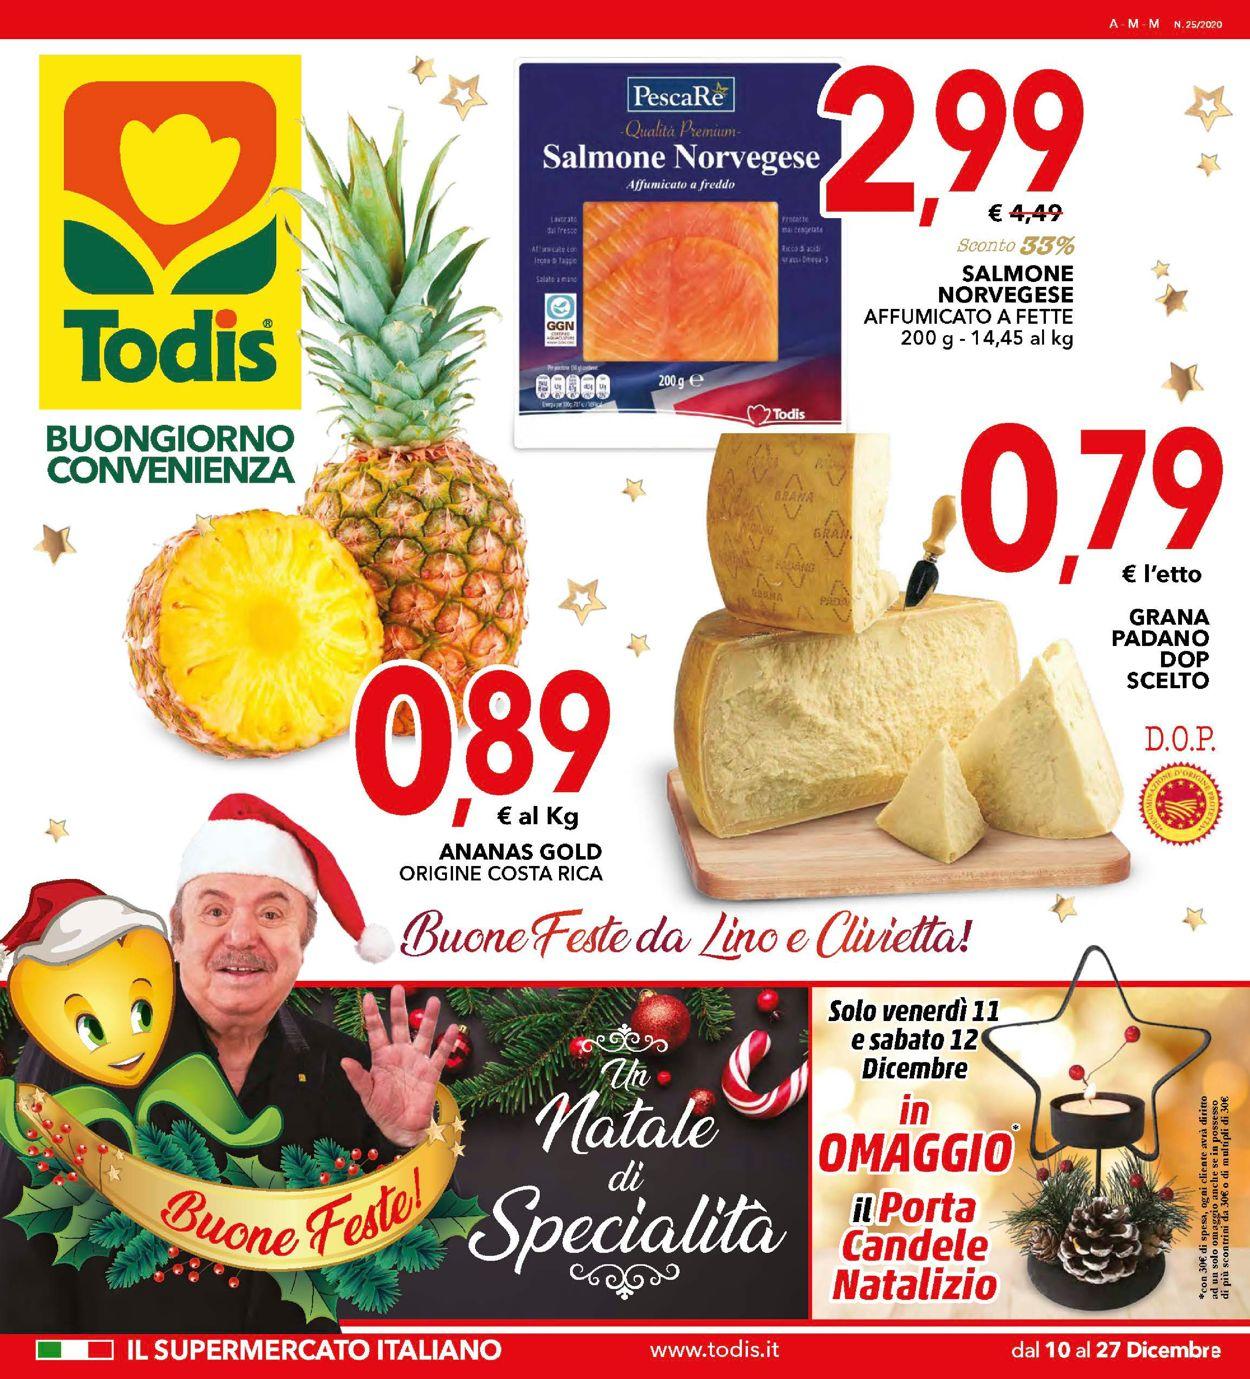 Volantino Todis - Natale 2020 - Offerte 10/12-27/12/2020